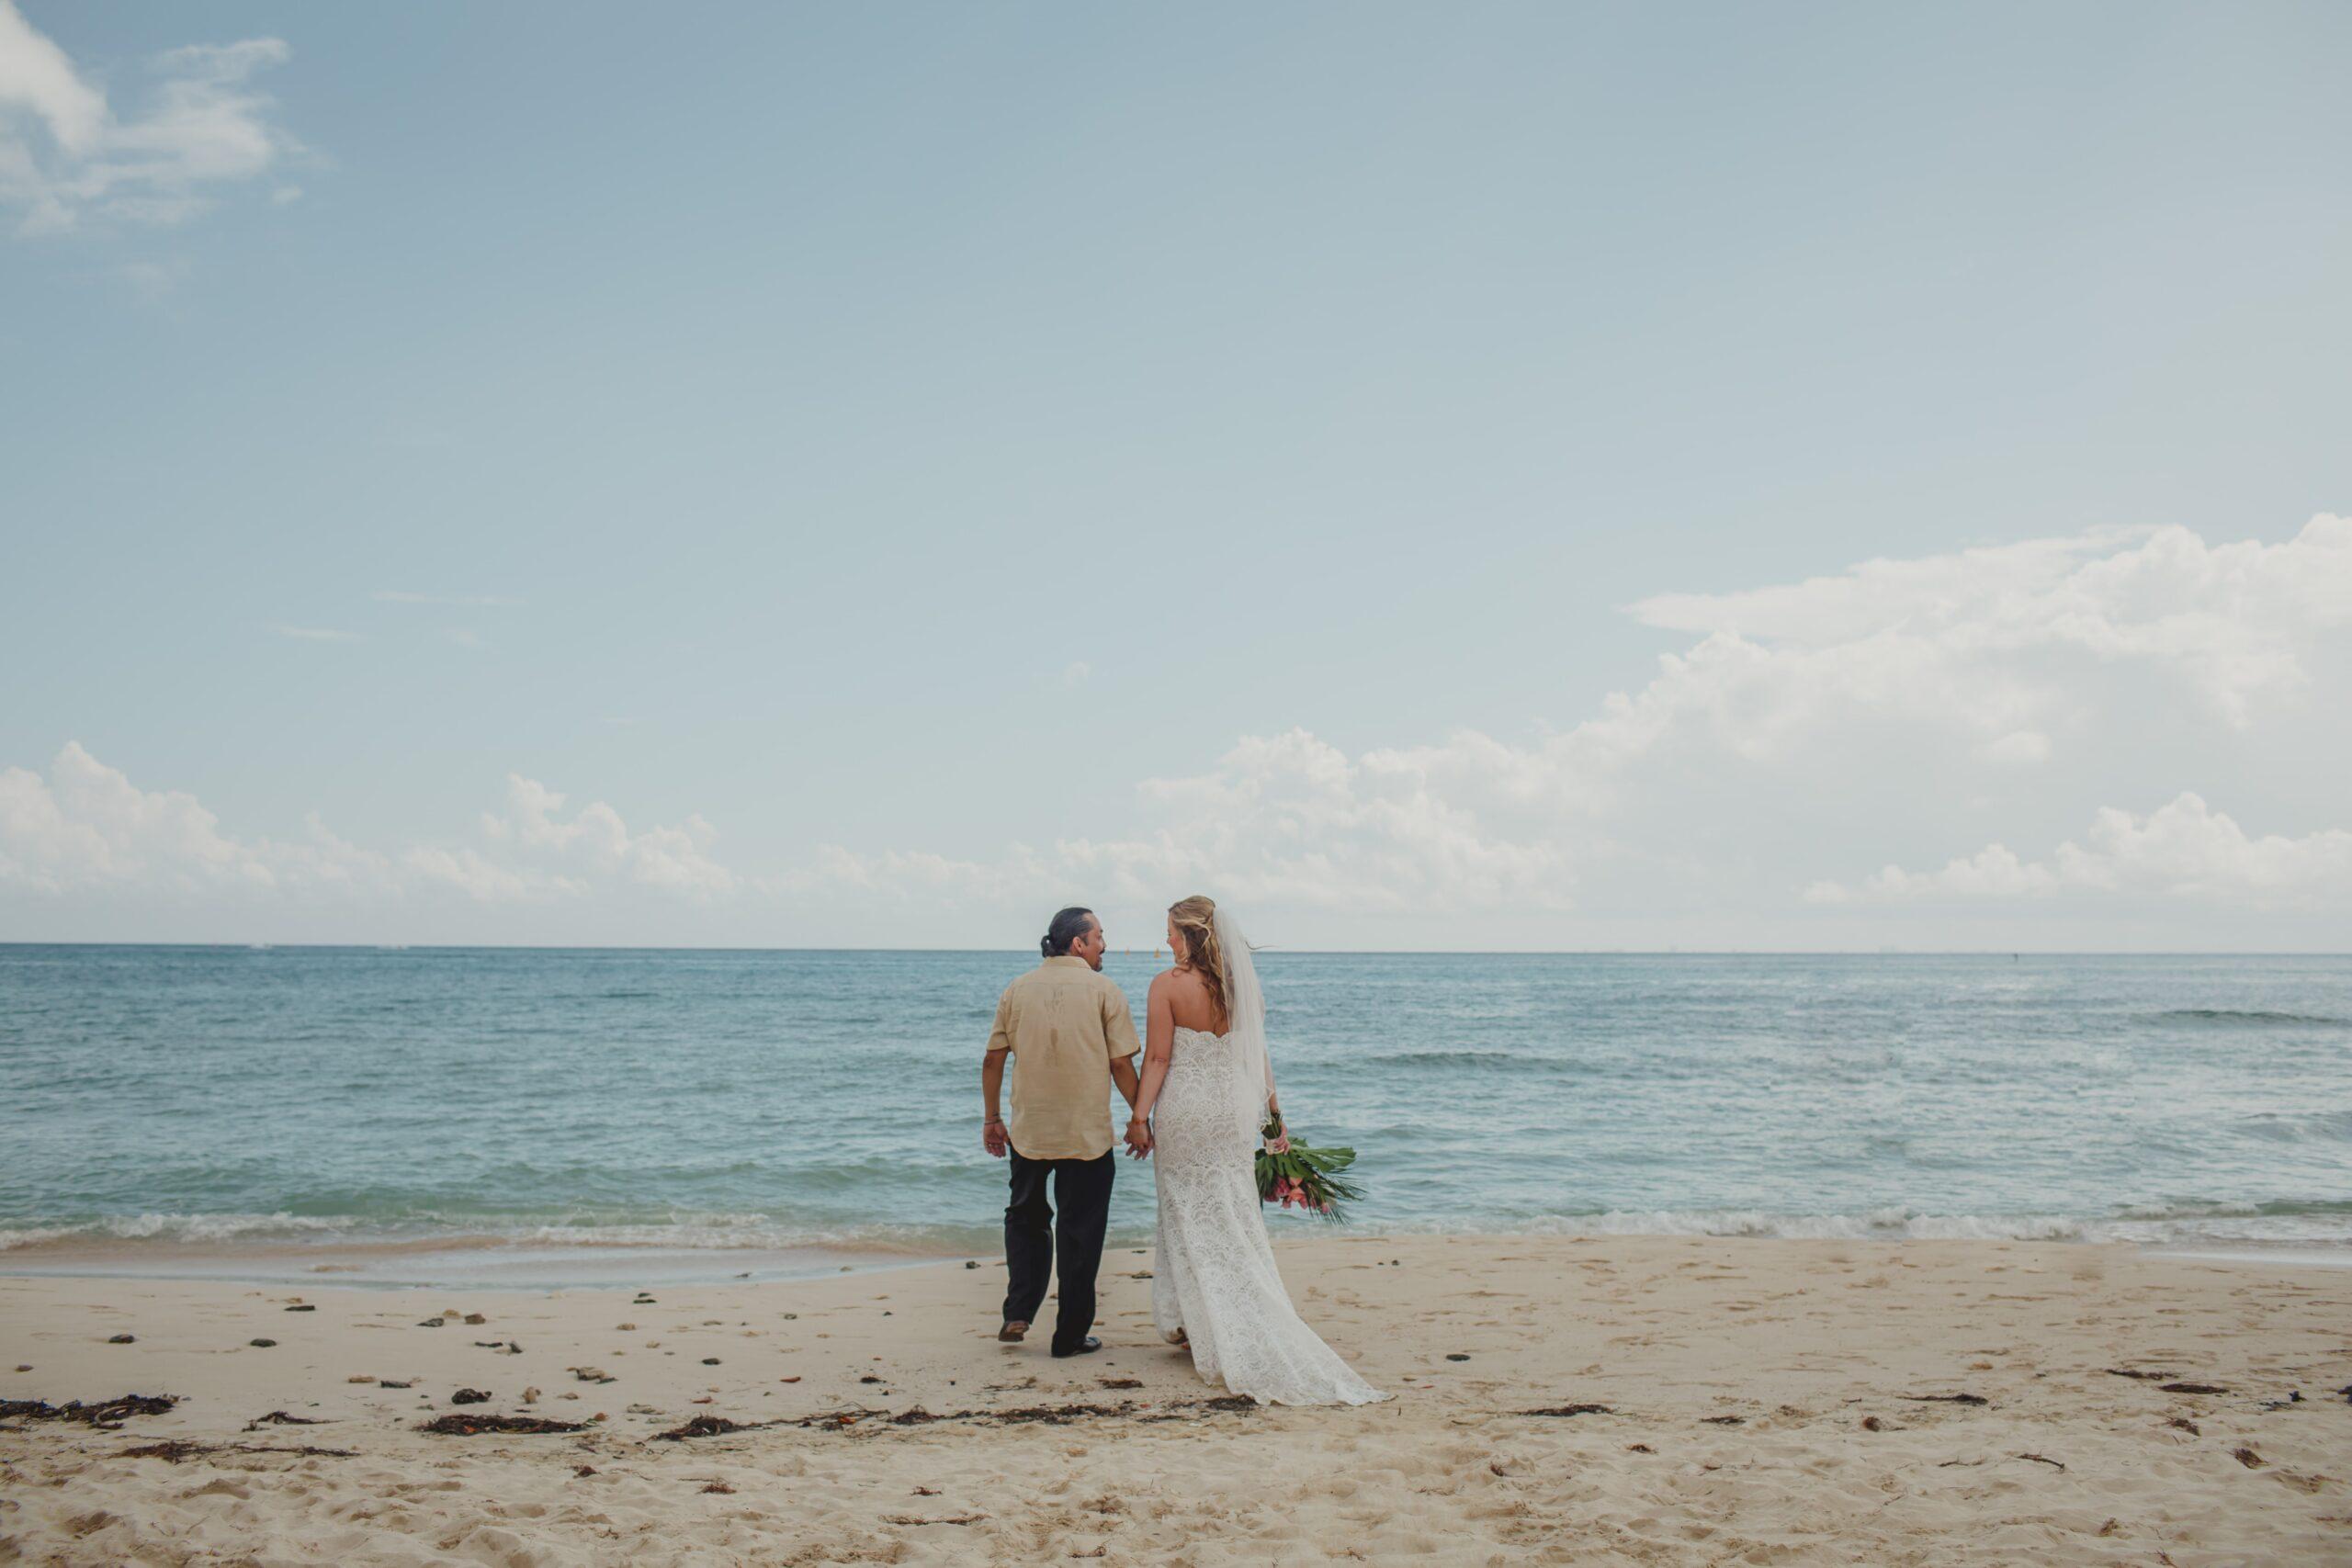 destination wedding paradise photo studio playa del carmen